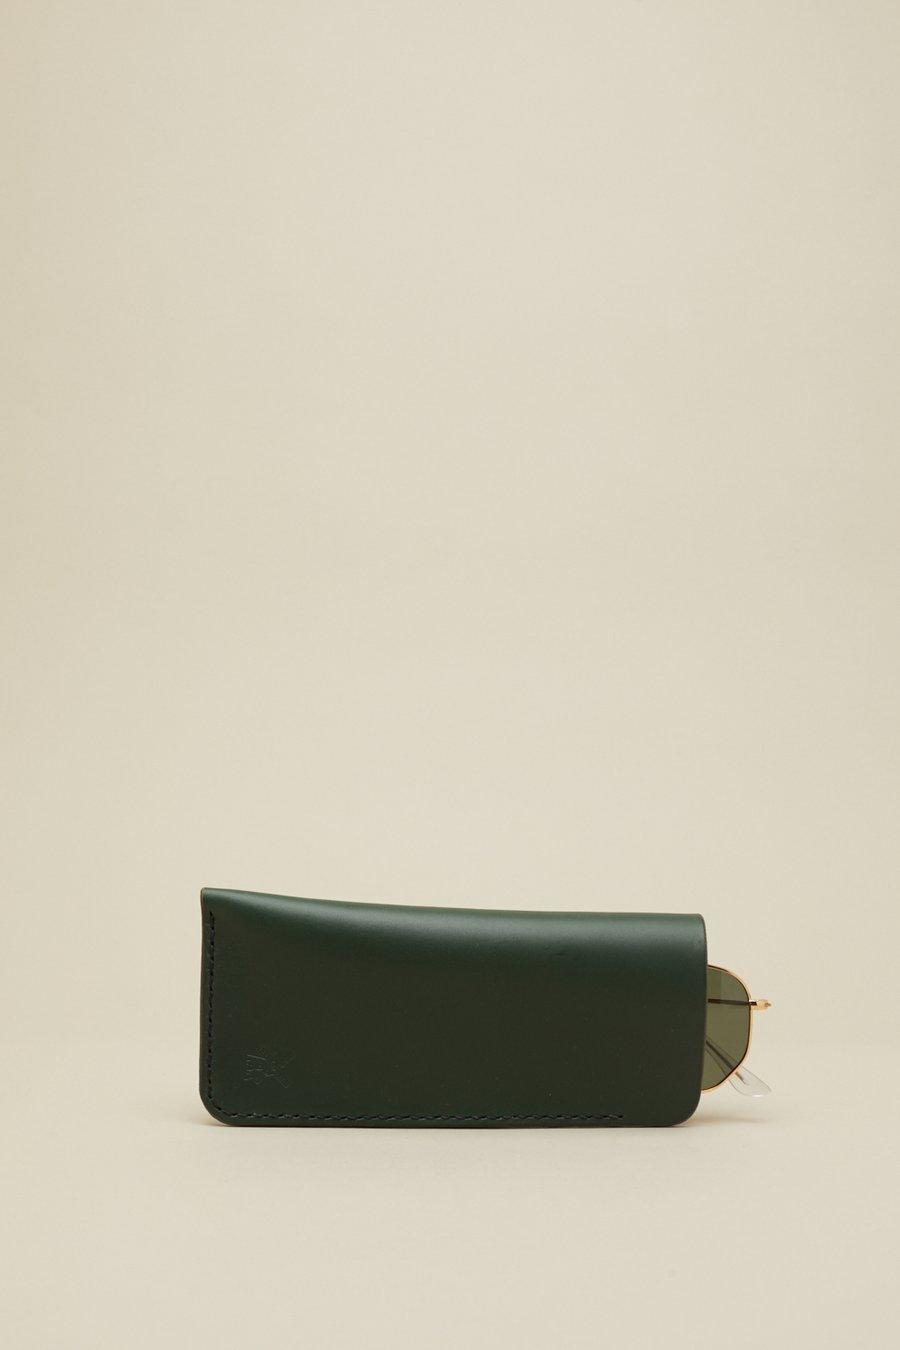 Image of Glasses Slip in Racing Green